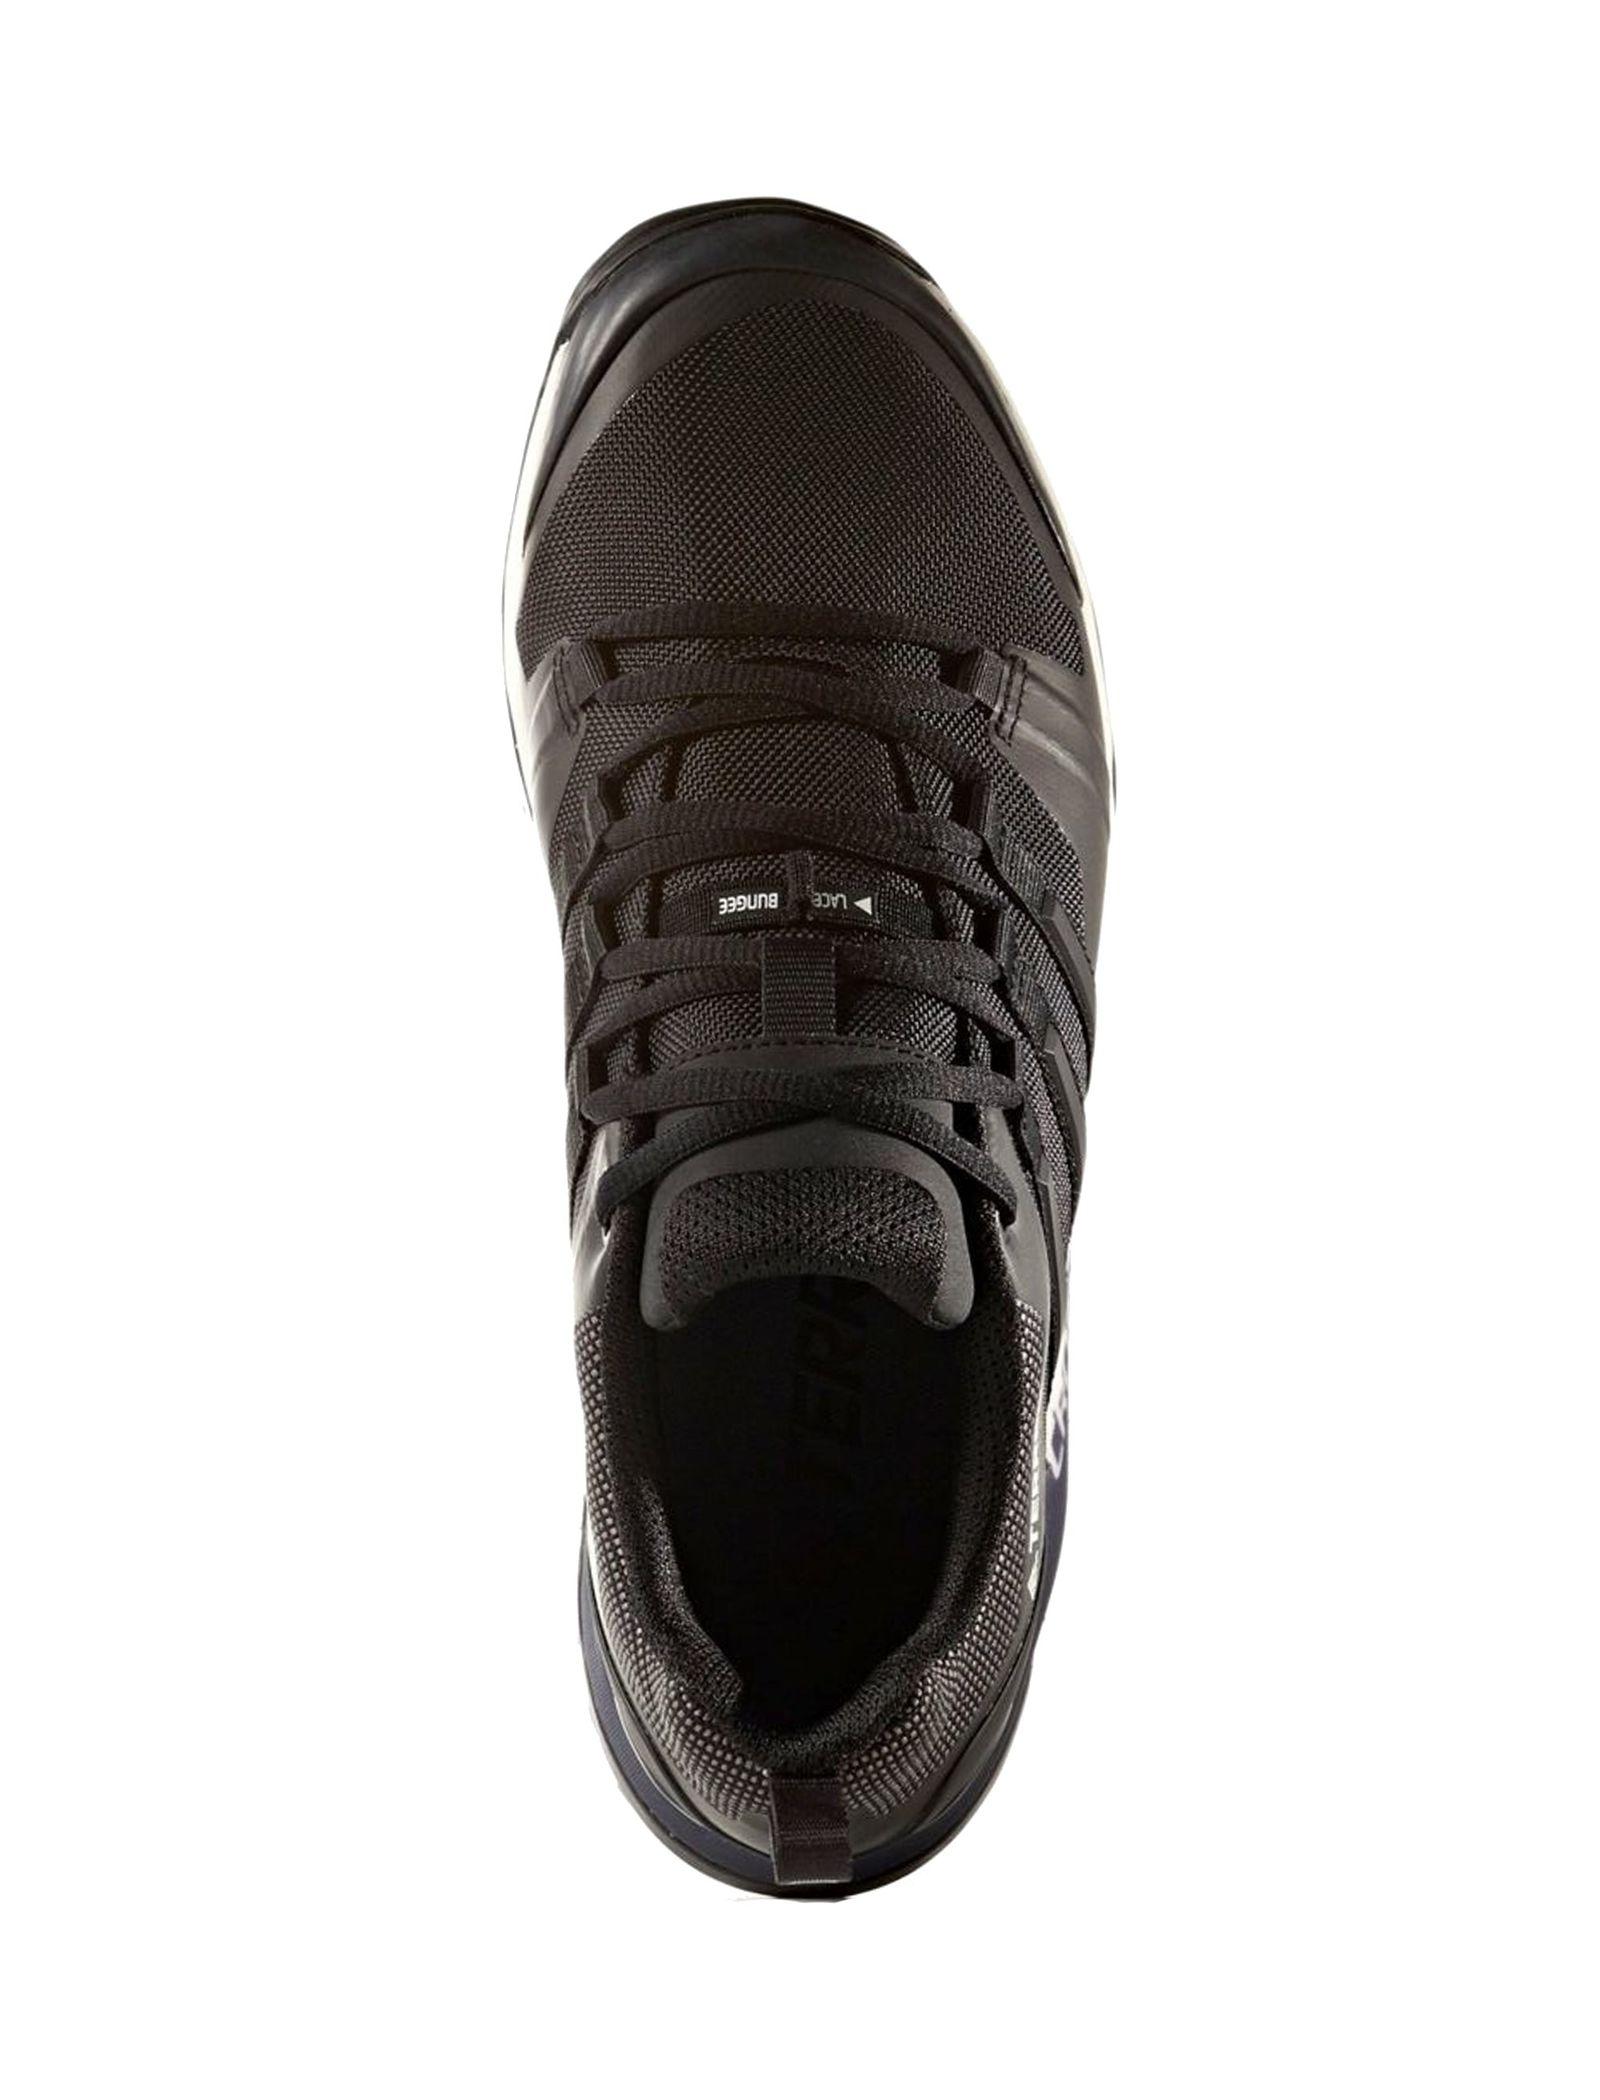 کفش طبیعت گردی بندی مردانه Terrex Trail Cross SL - آدیداس - مشکي - 2